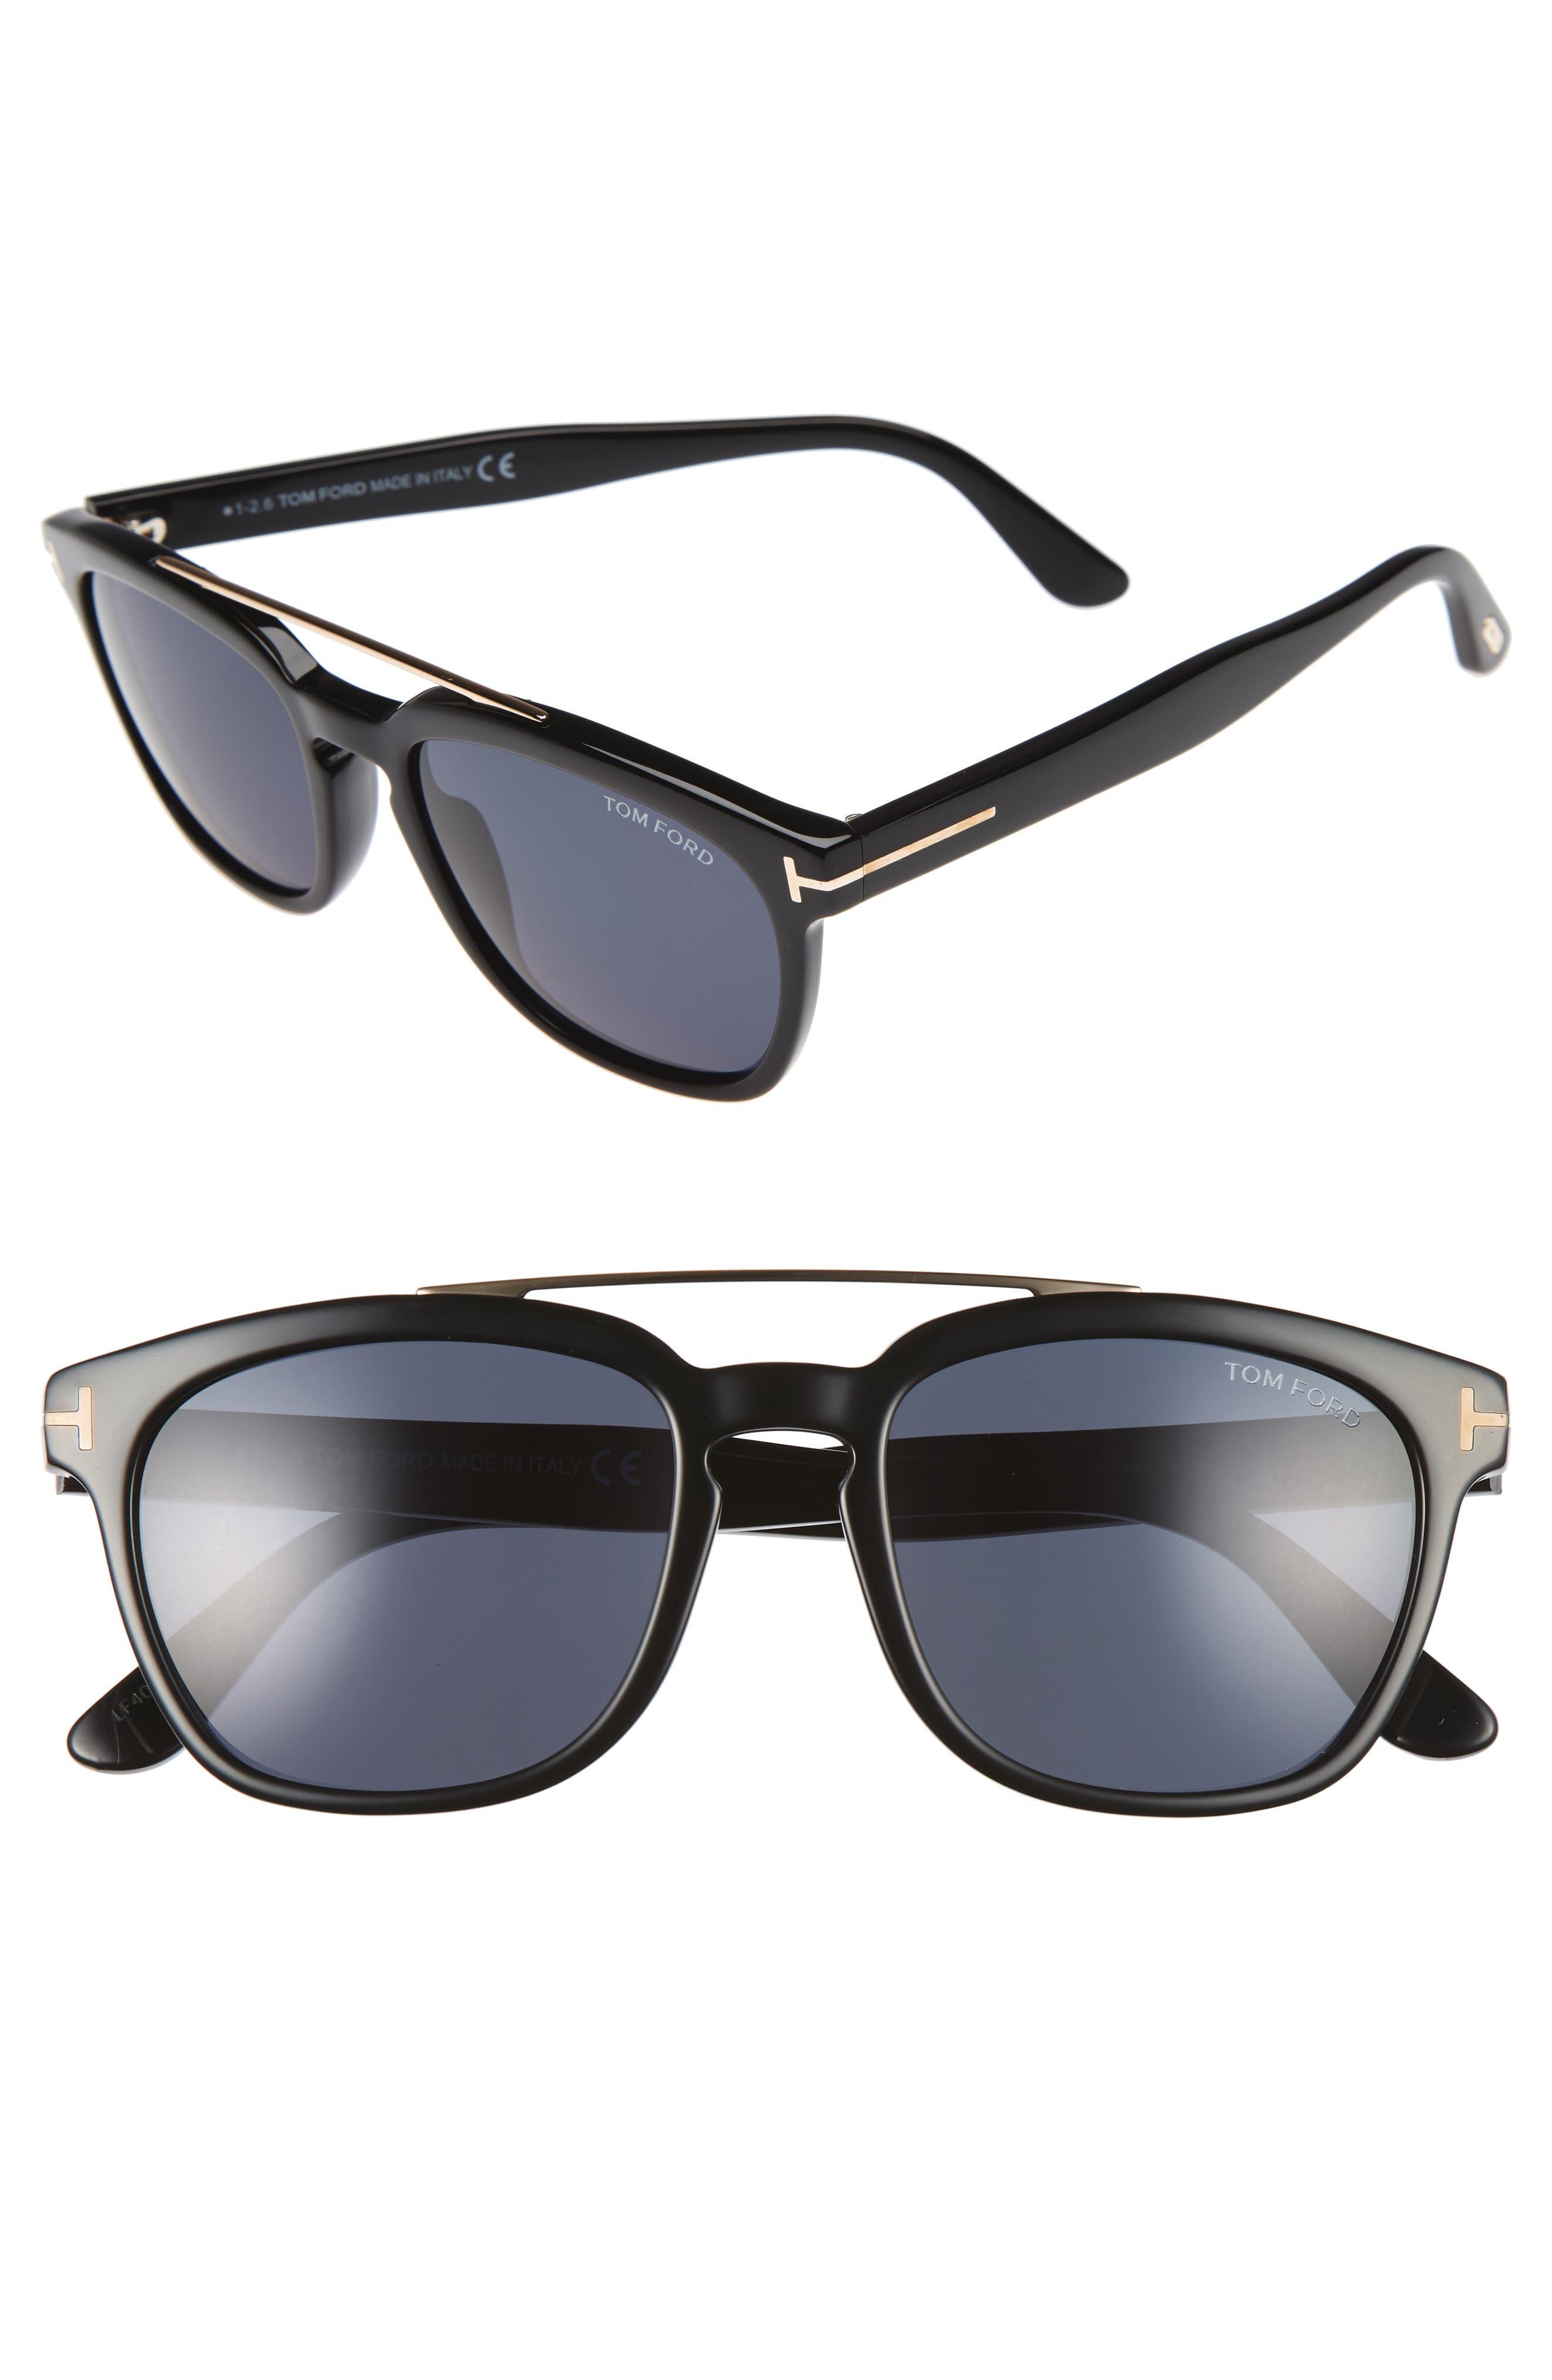 Tom Ford Holt 54mm Sunglasses